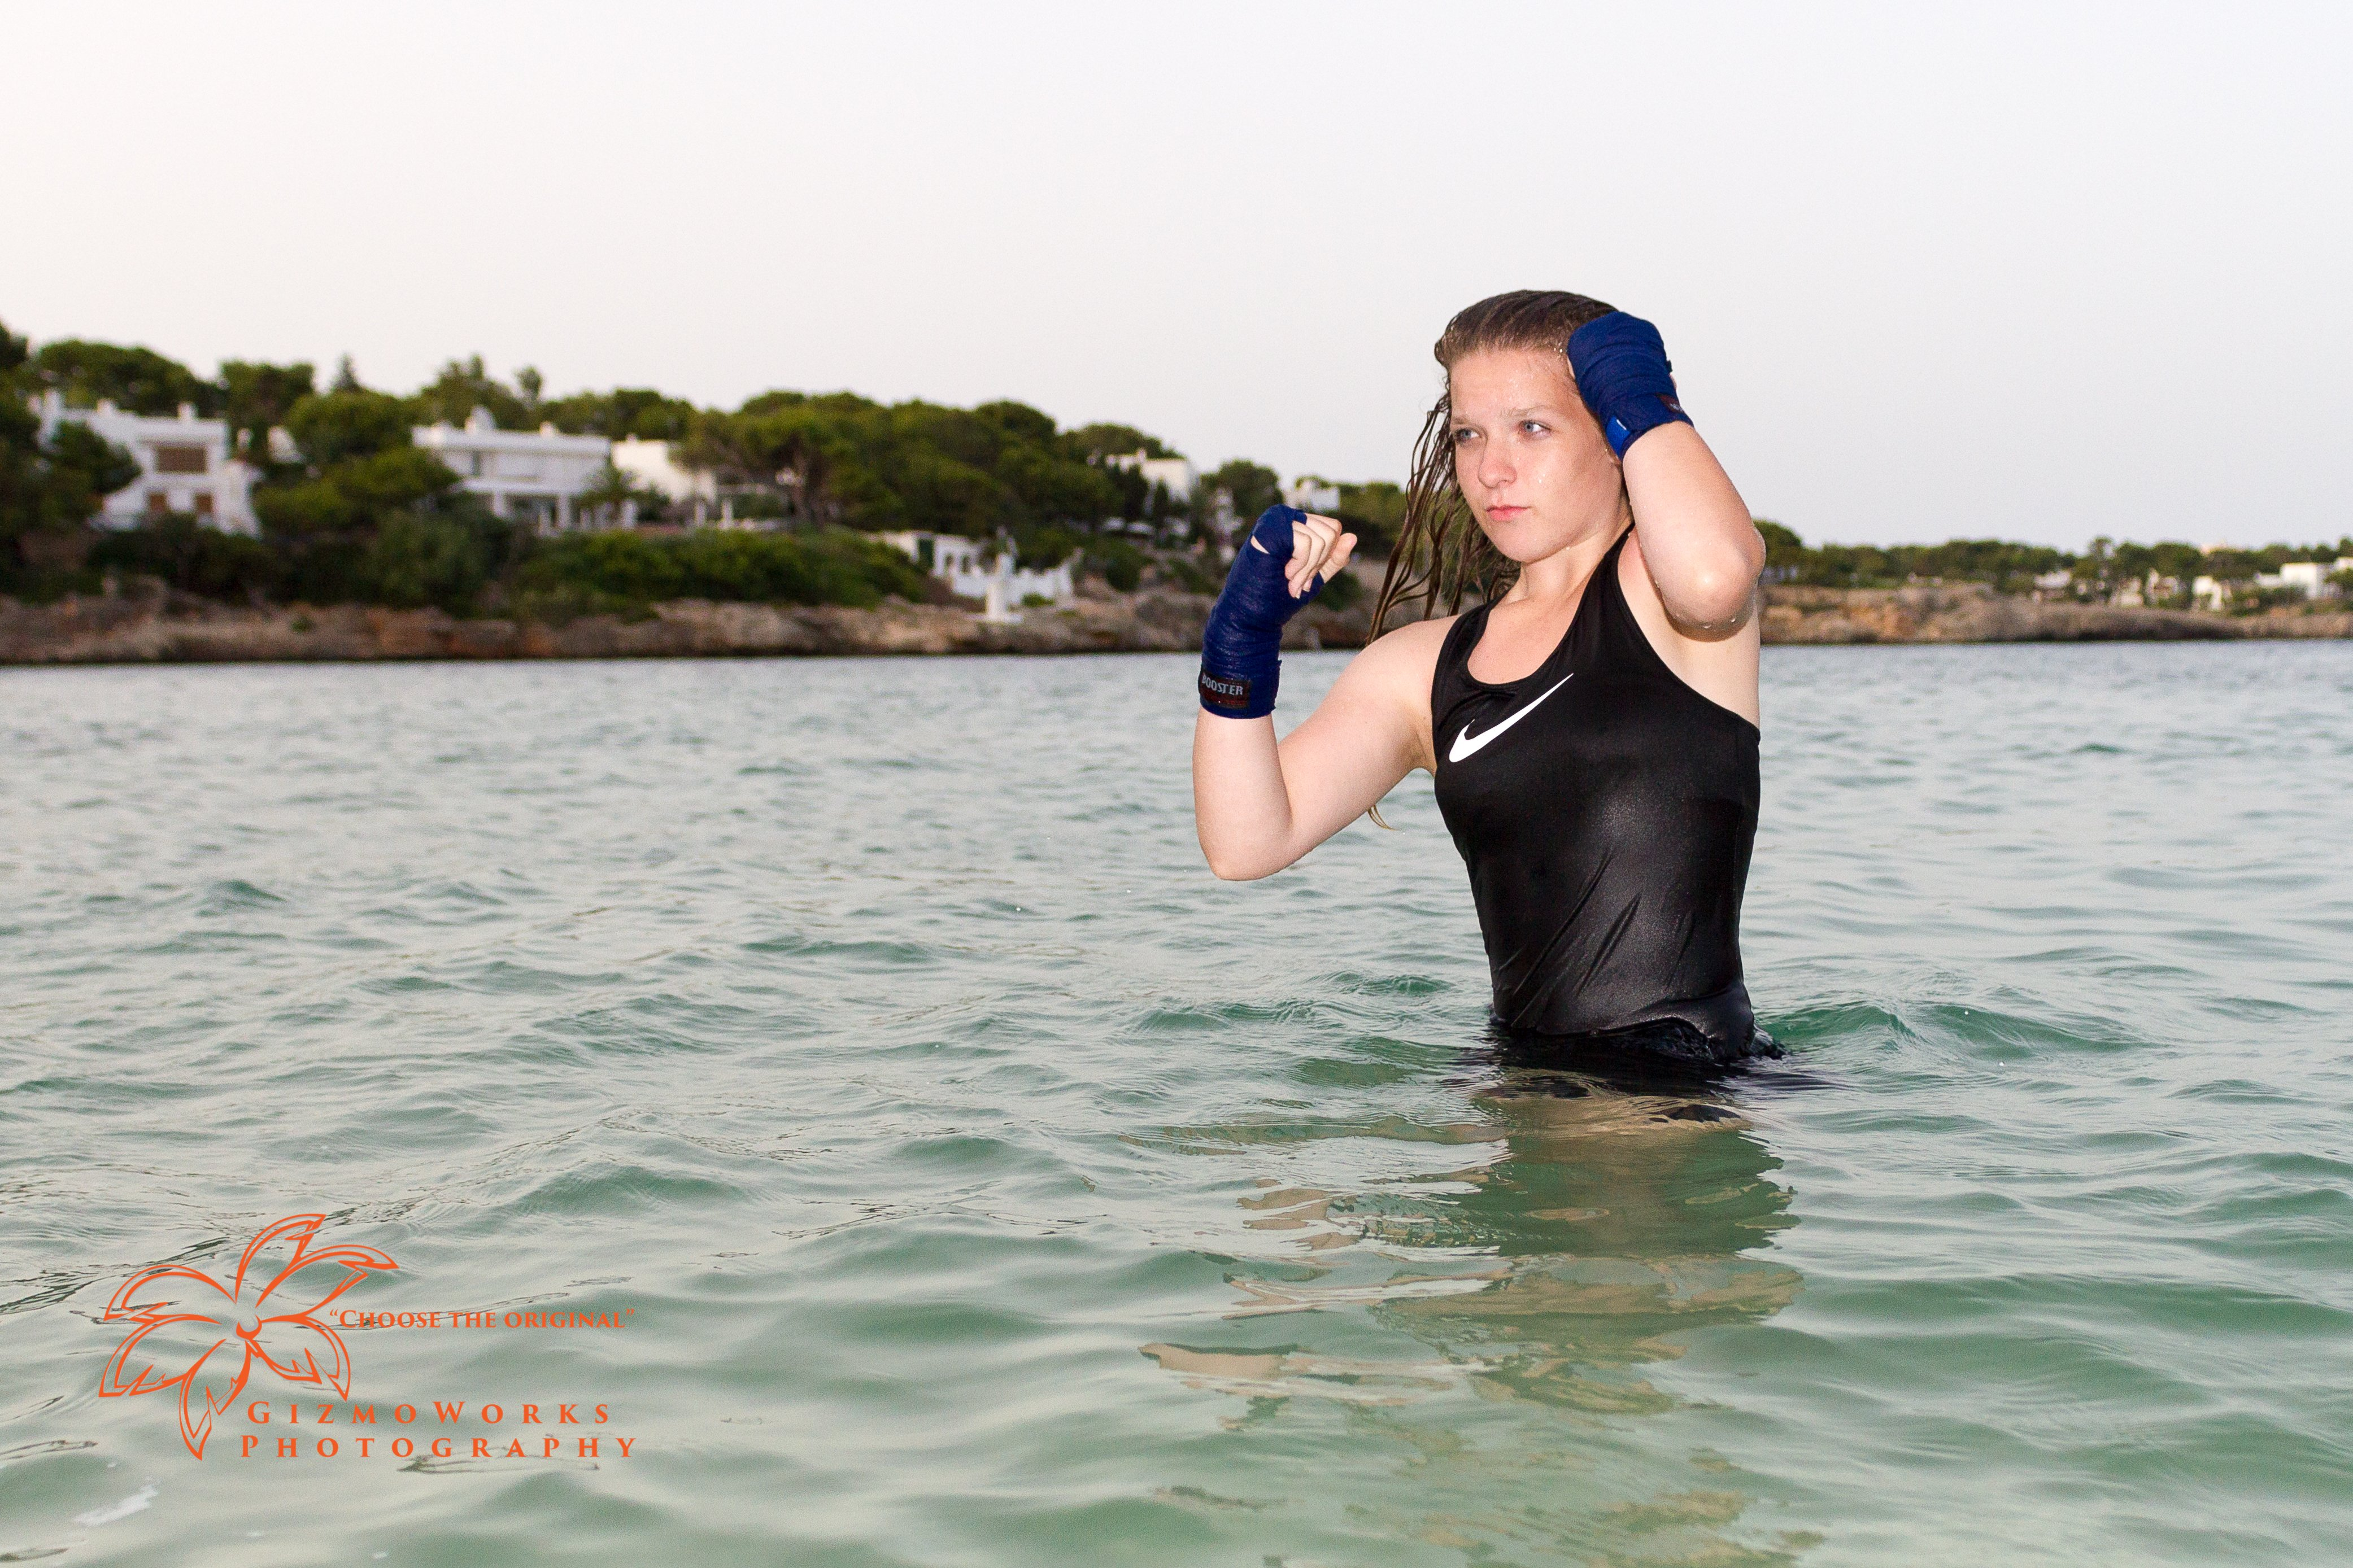 Location Shoot Kickboxer Alicia Thijssen Cala d'Or Mallorca